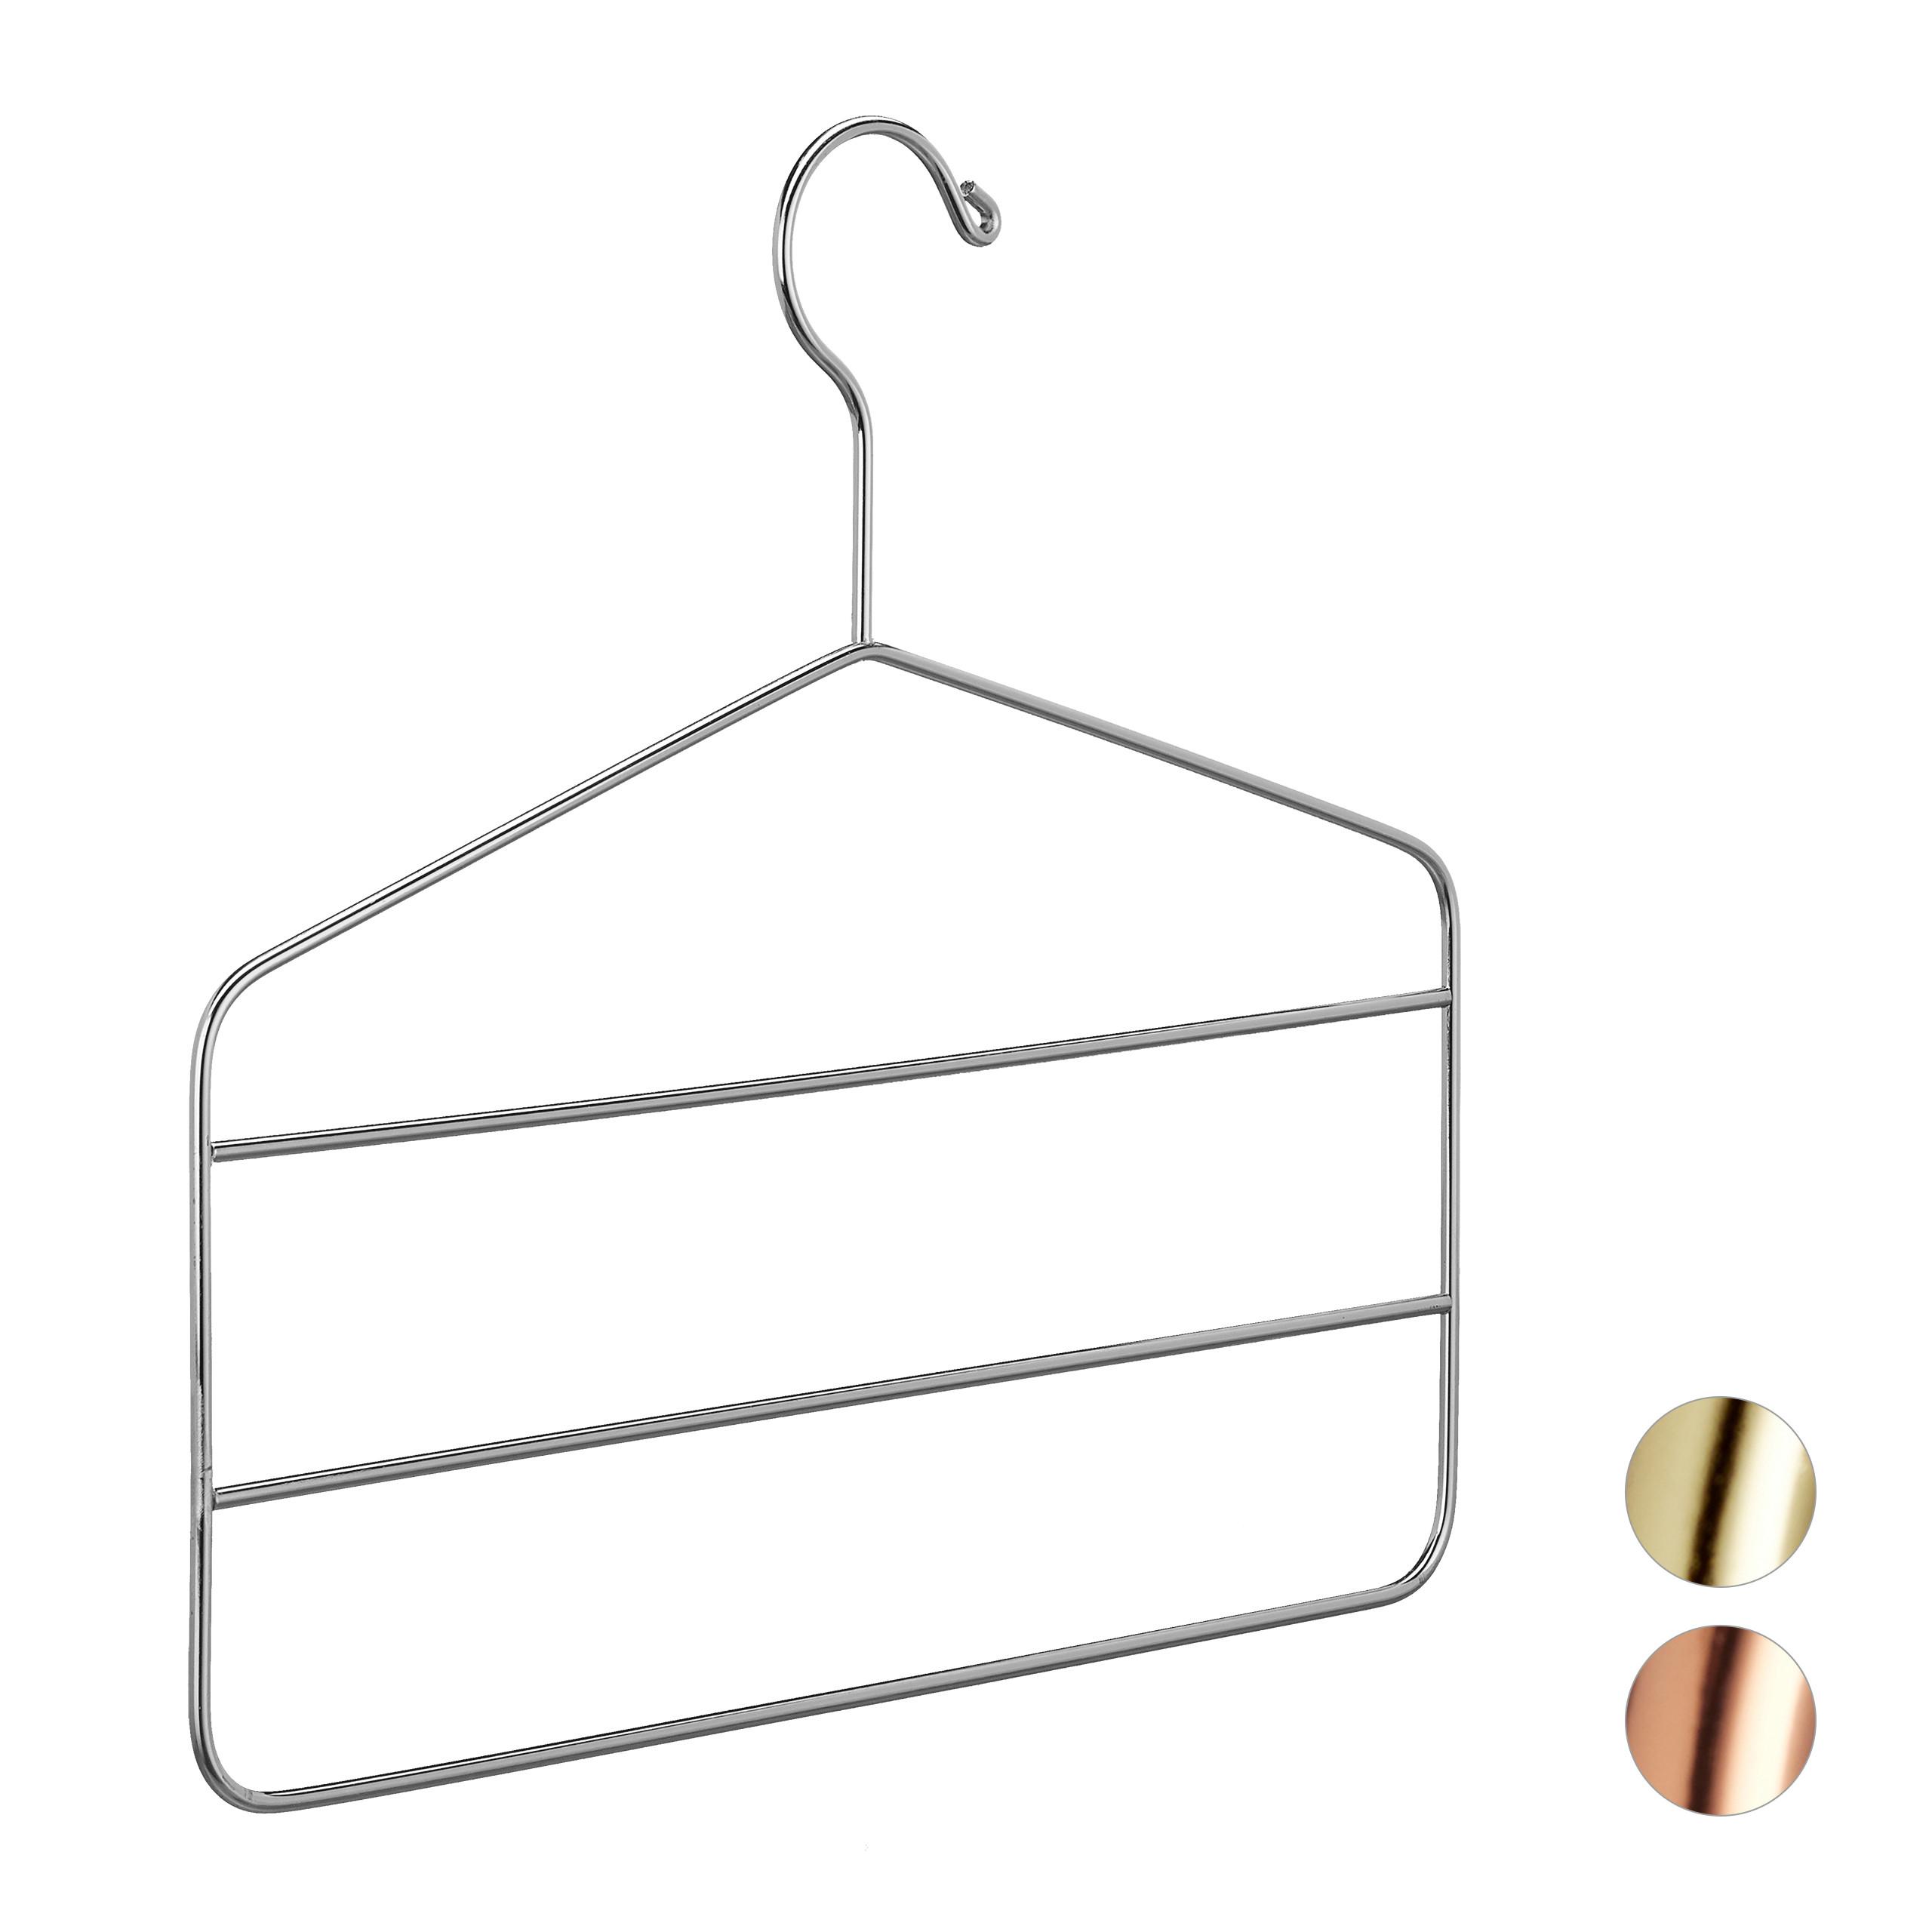 2 x Hosenbügel Metall Rockbügel silber Hosenkleiderbügel Kleiderbügel mehrfach